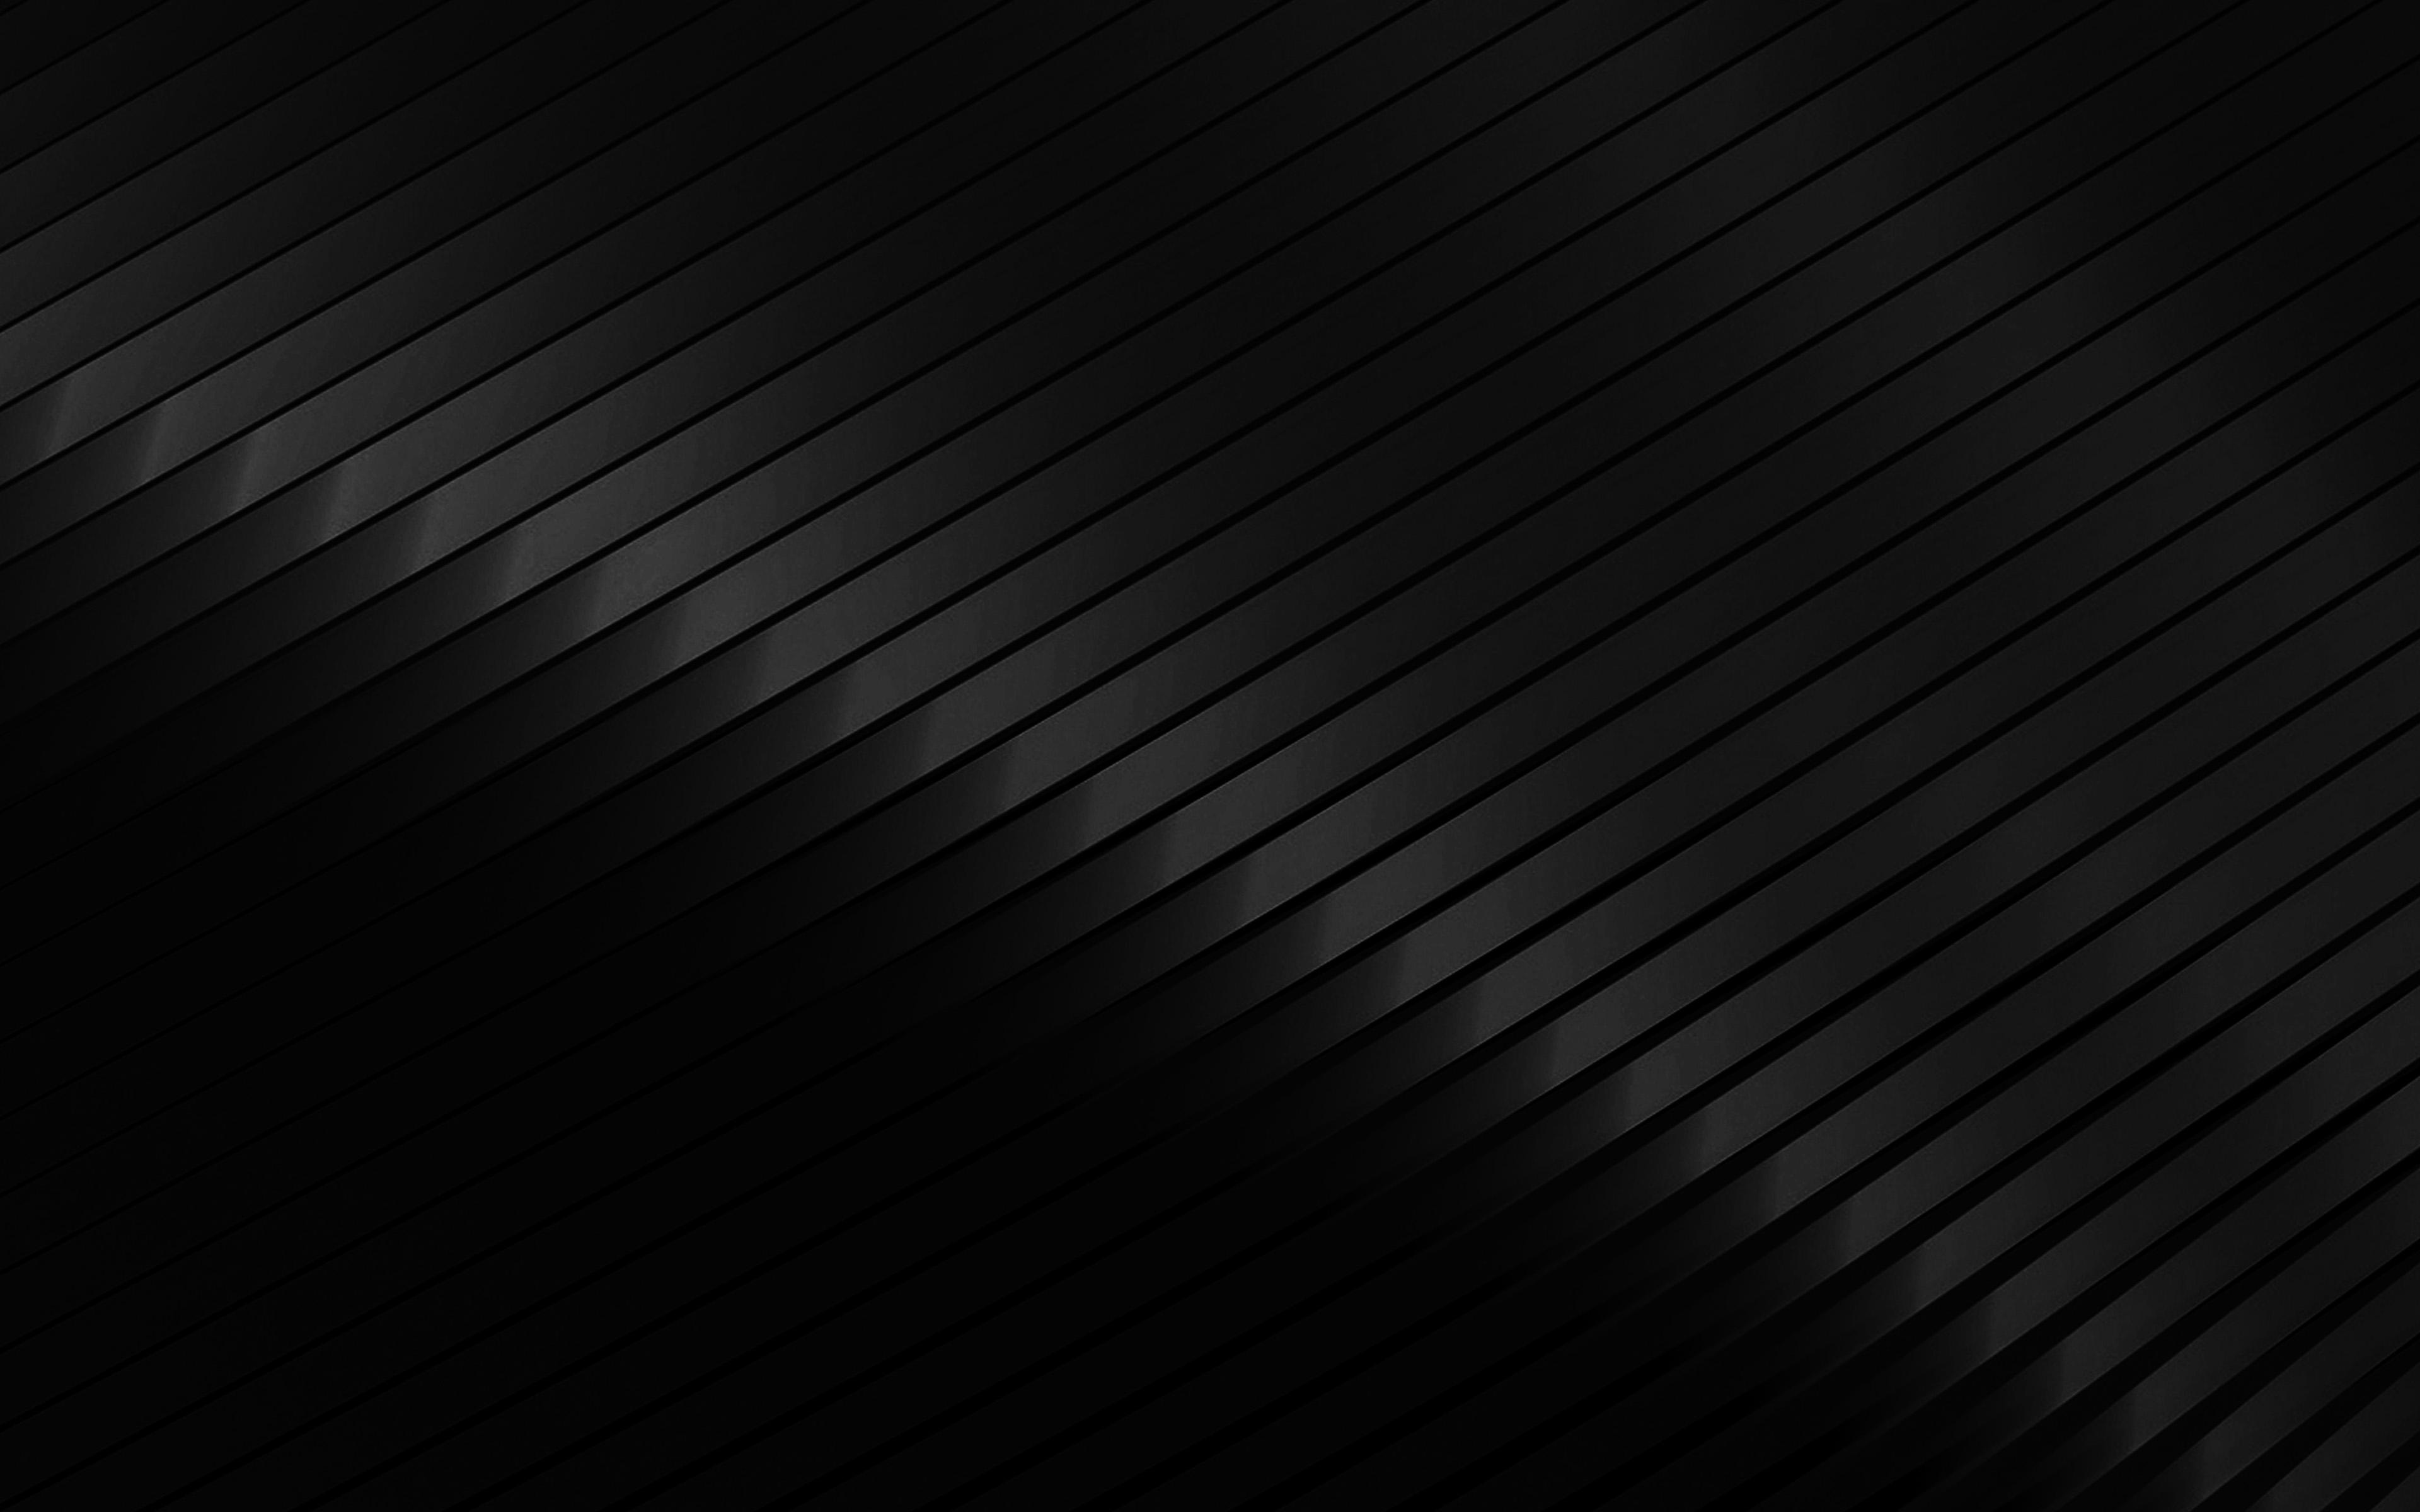 vp79-lg-g-flex-dark-bw-line-gray-pattern-black-wallpaper